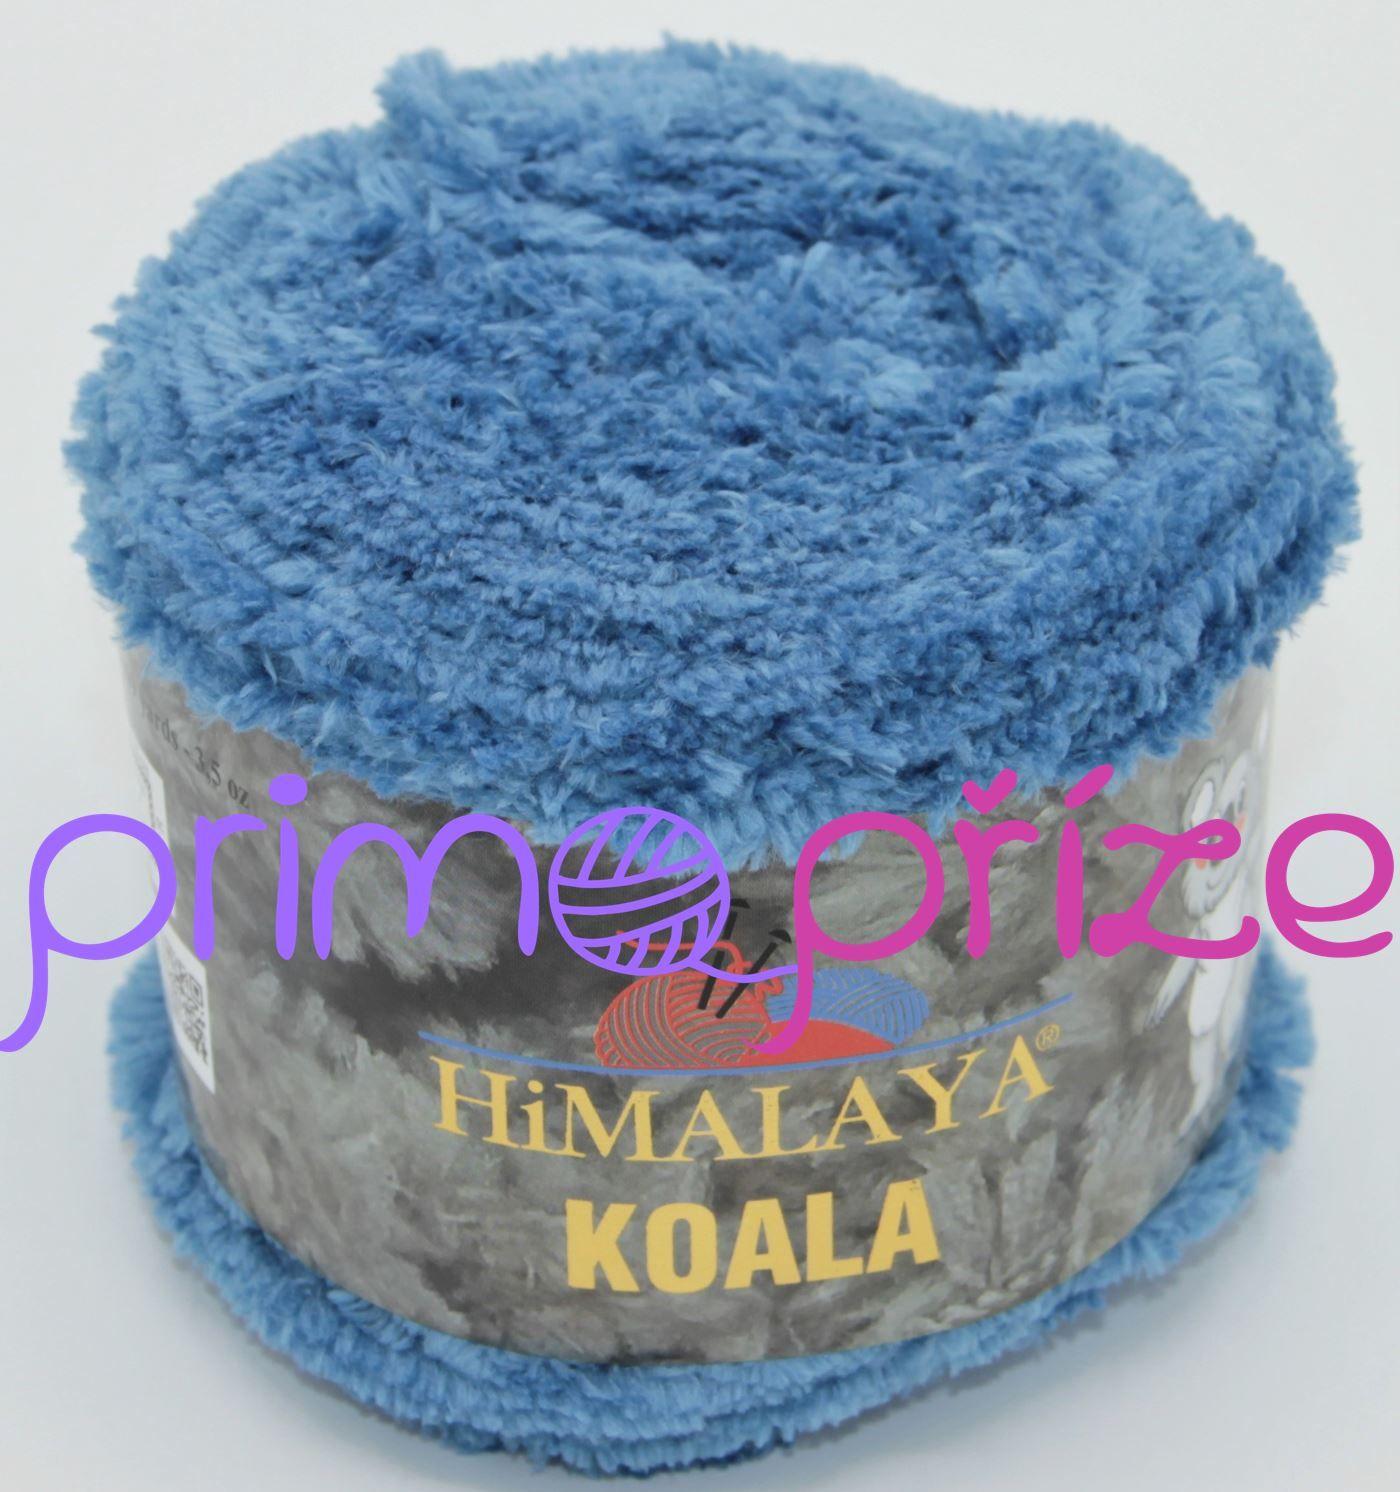 HIMALAYA Koala 75727